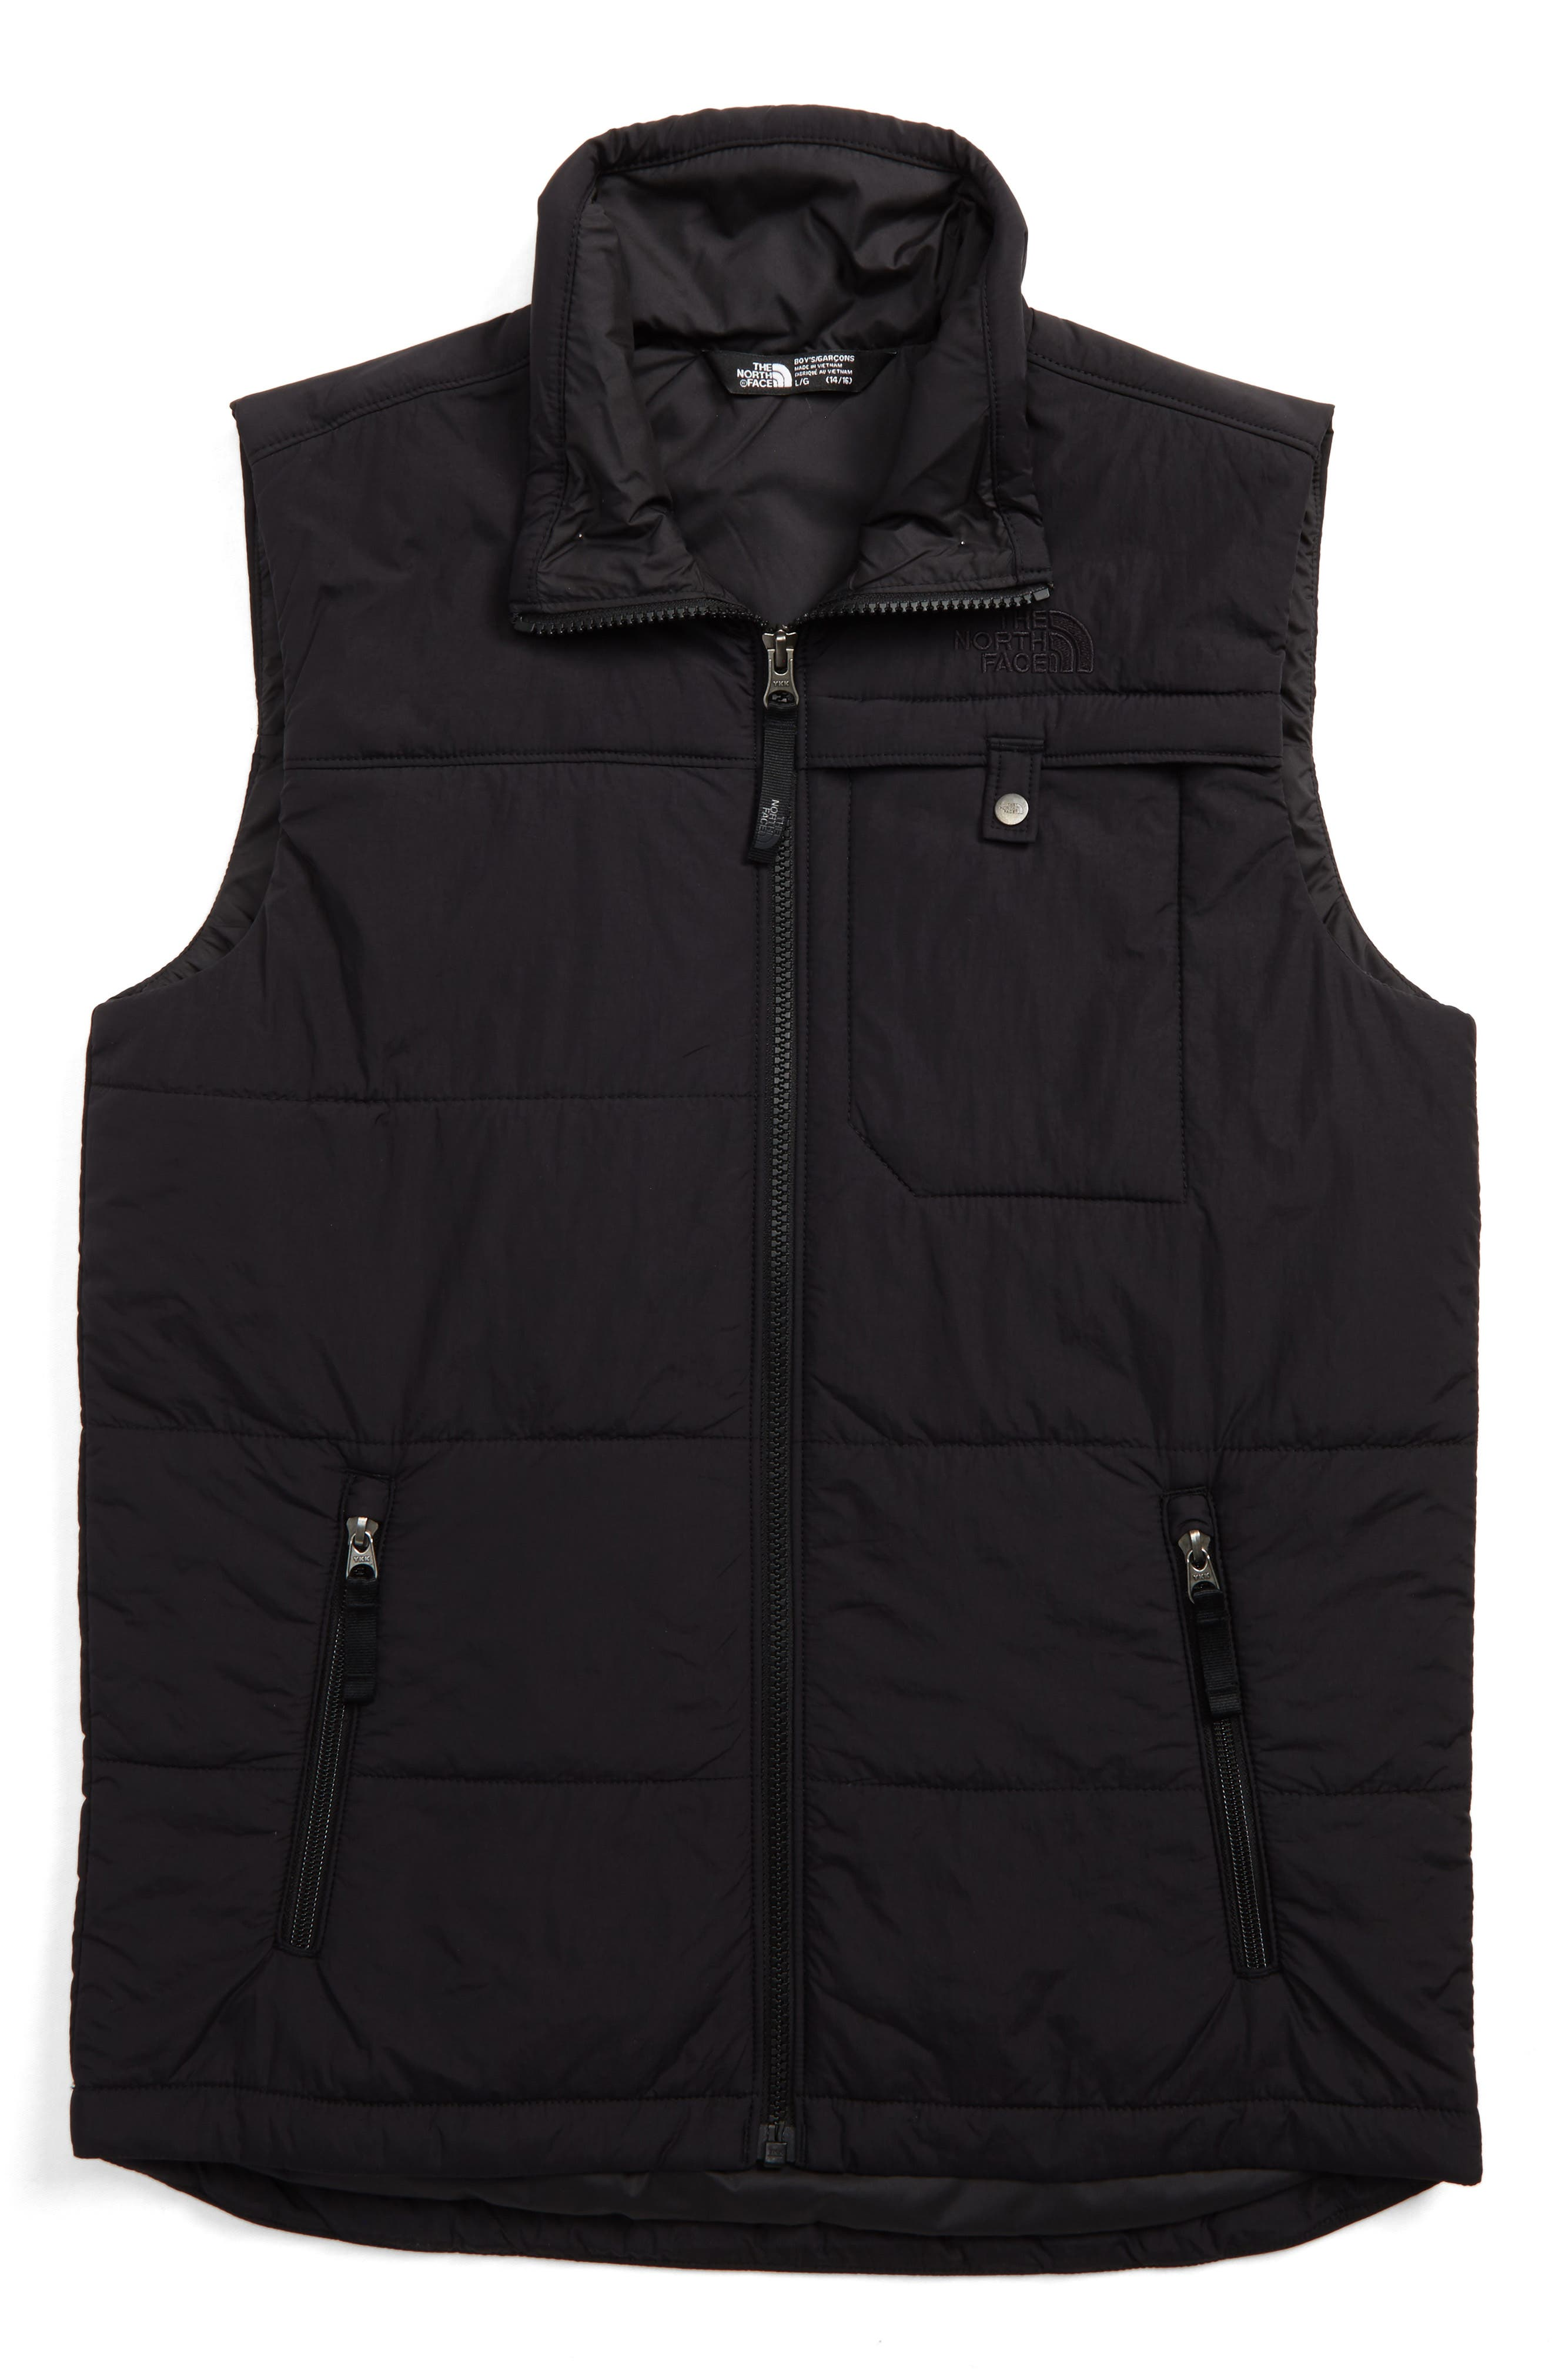 THE NORTH FACE Harway Heatseeker<sup>™</sup> Water Resistant Vest